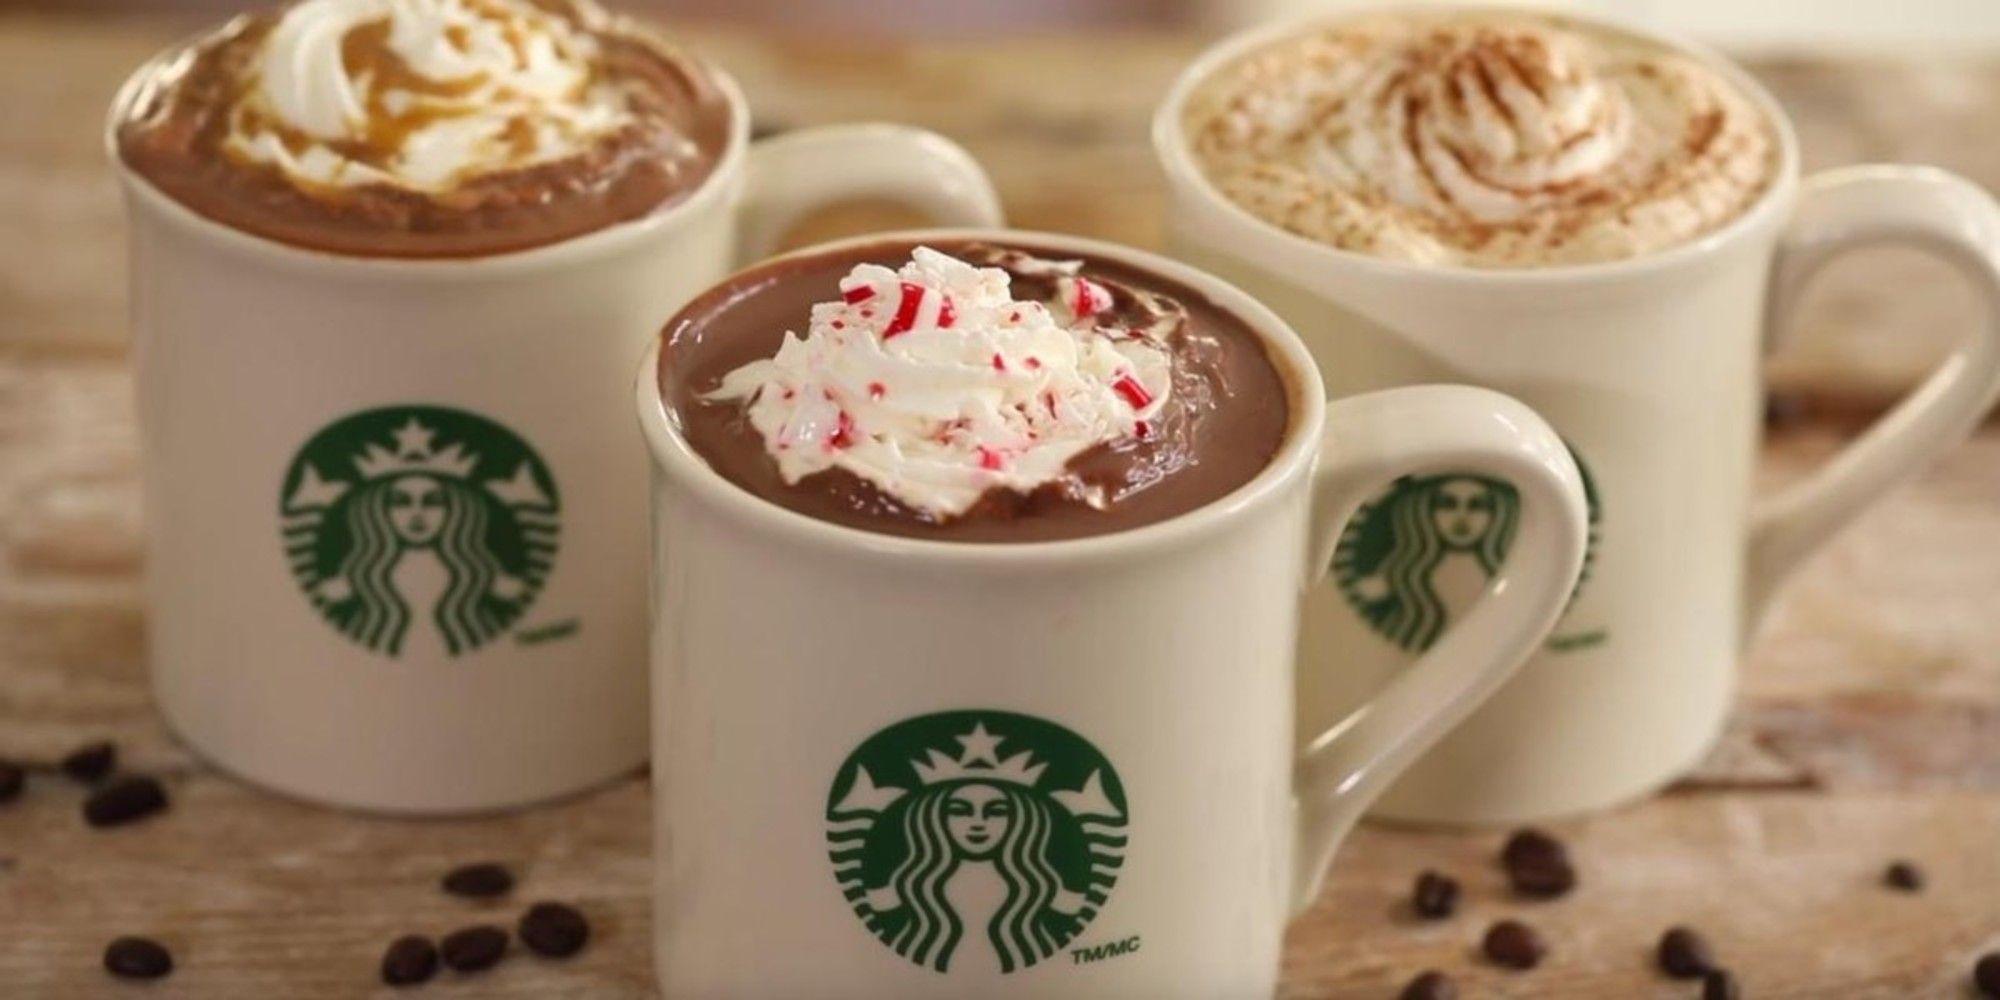 Forum on this topic: The Genius Pumpkin Spice Latte Hack to , the-genius-pumpkin-spice-latte-hack-to/